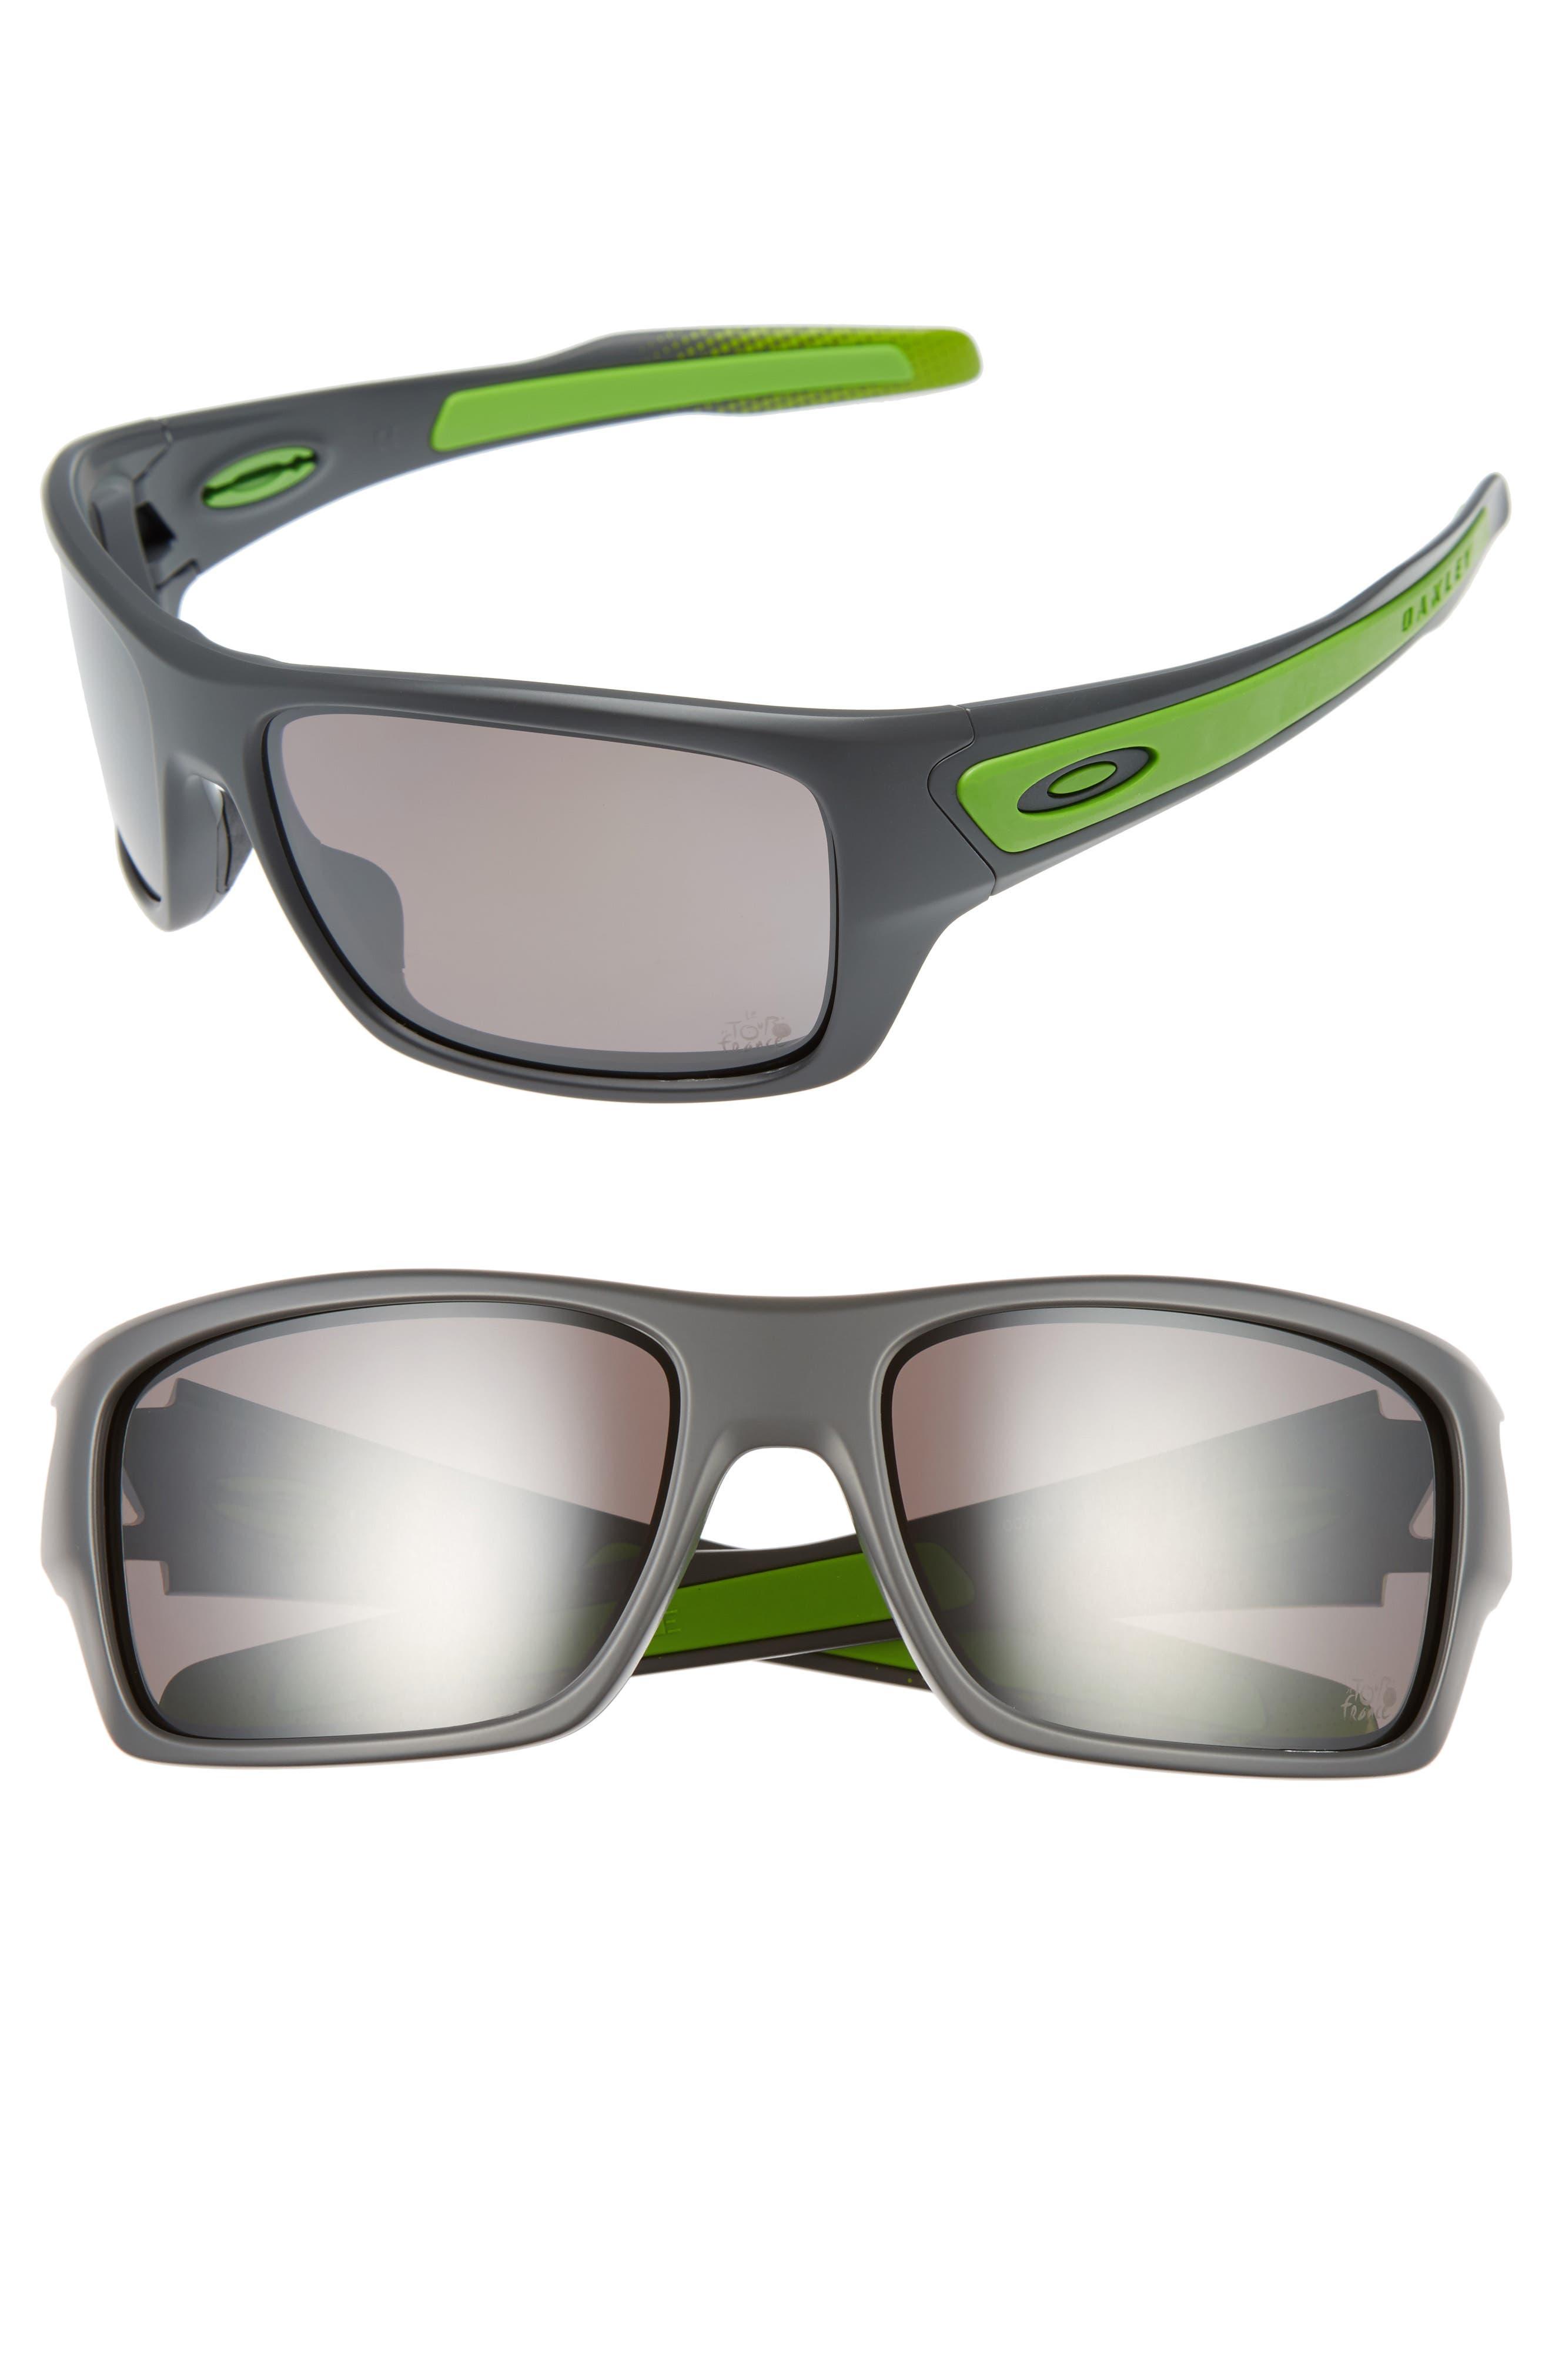 Oakley Turbine Rotor 65mm Polarized Sunglasses